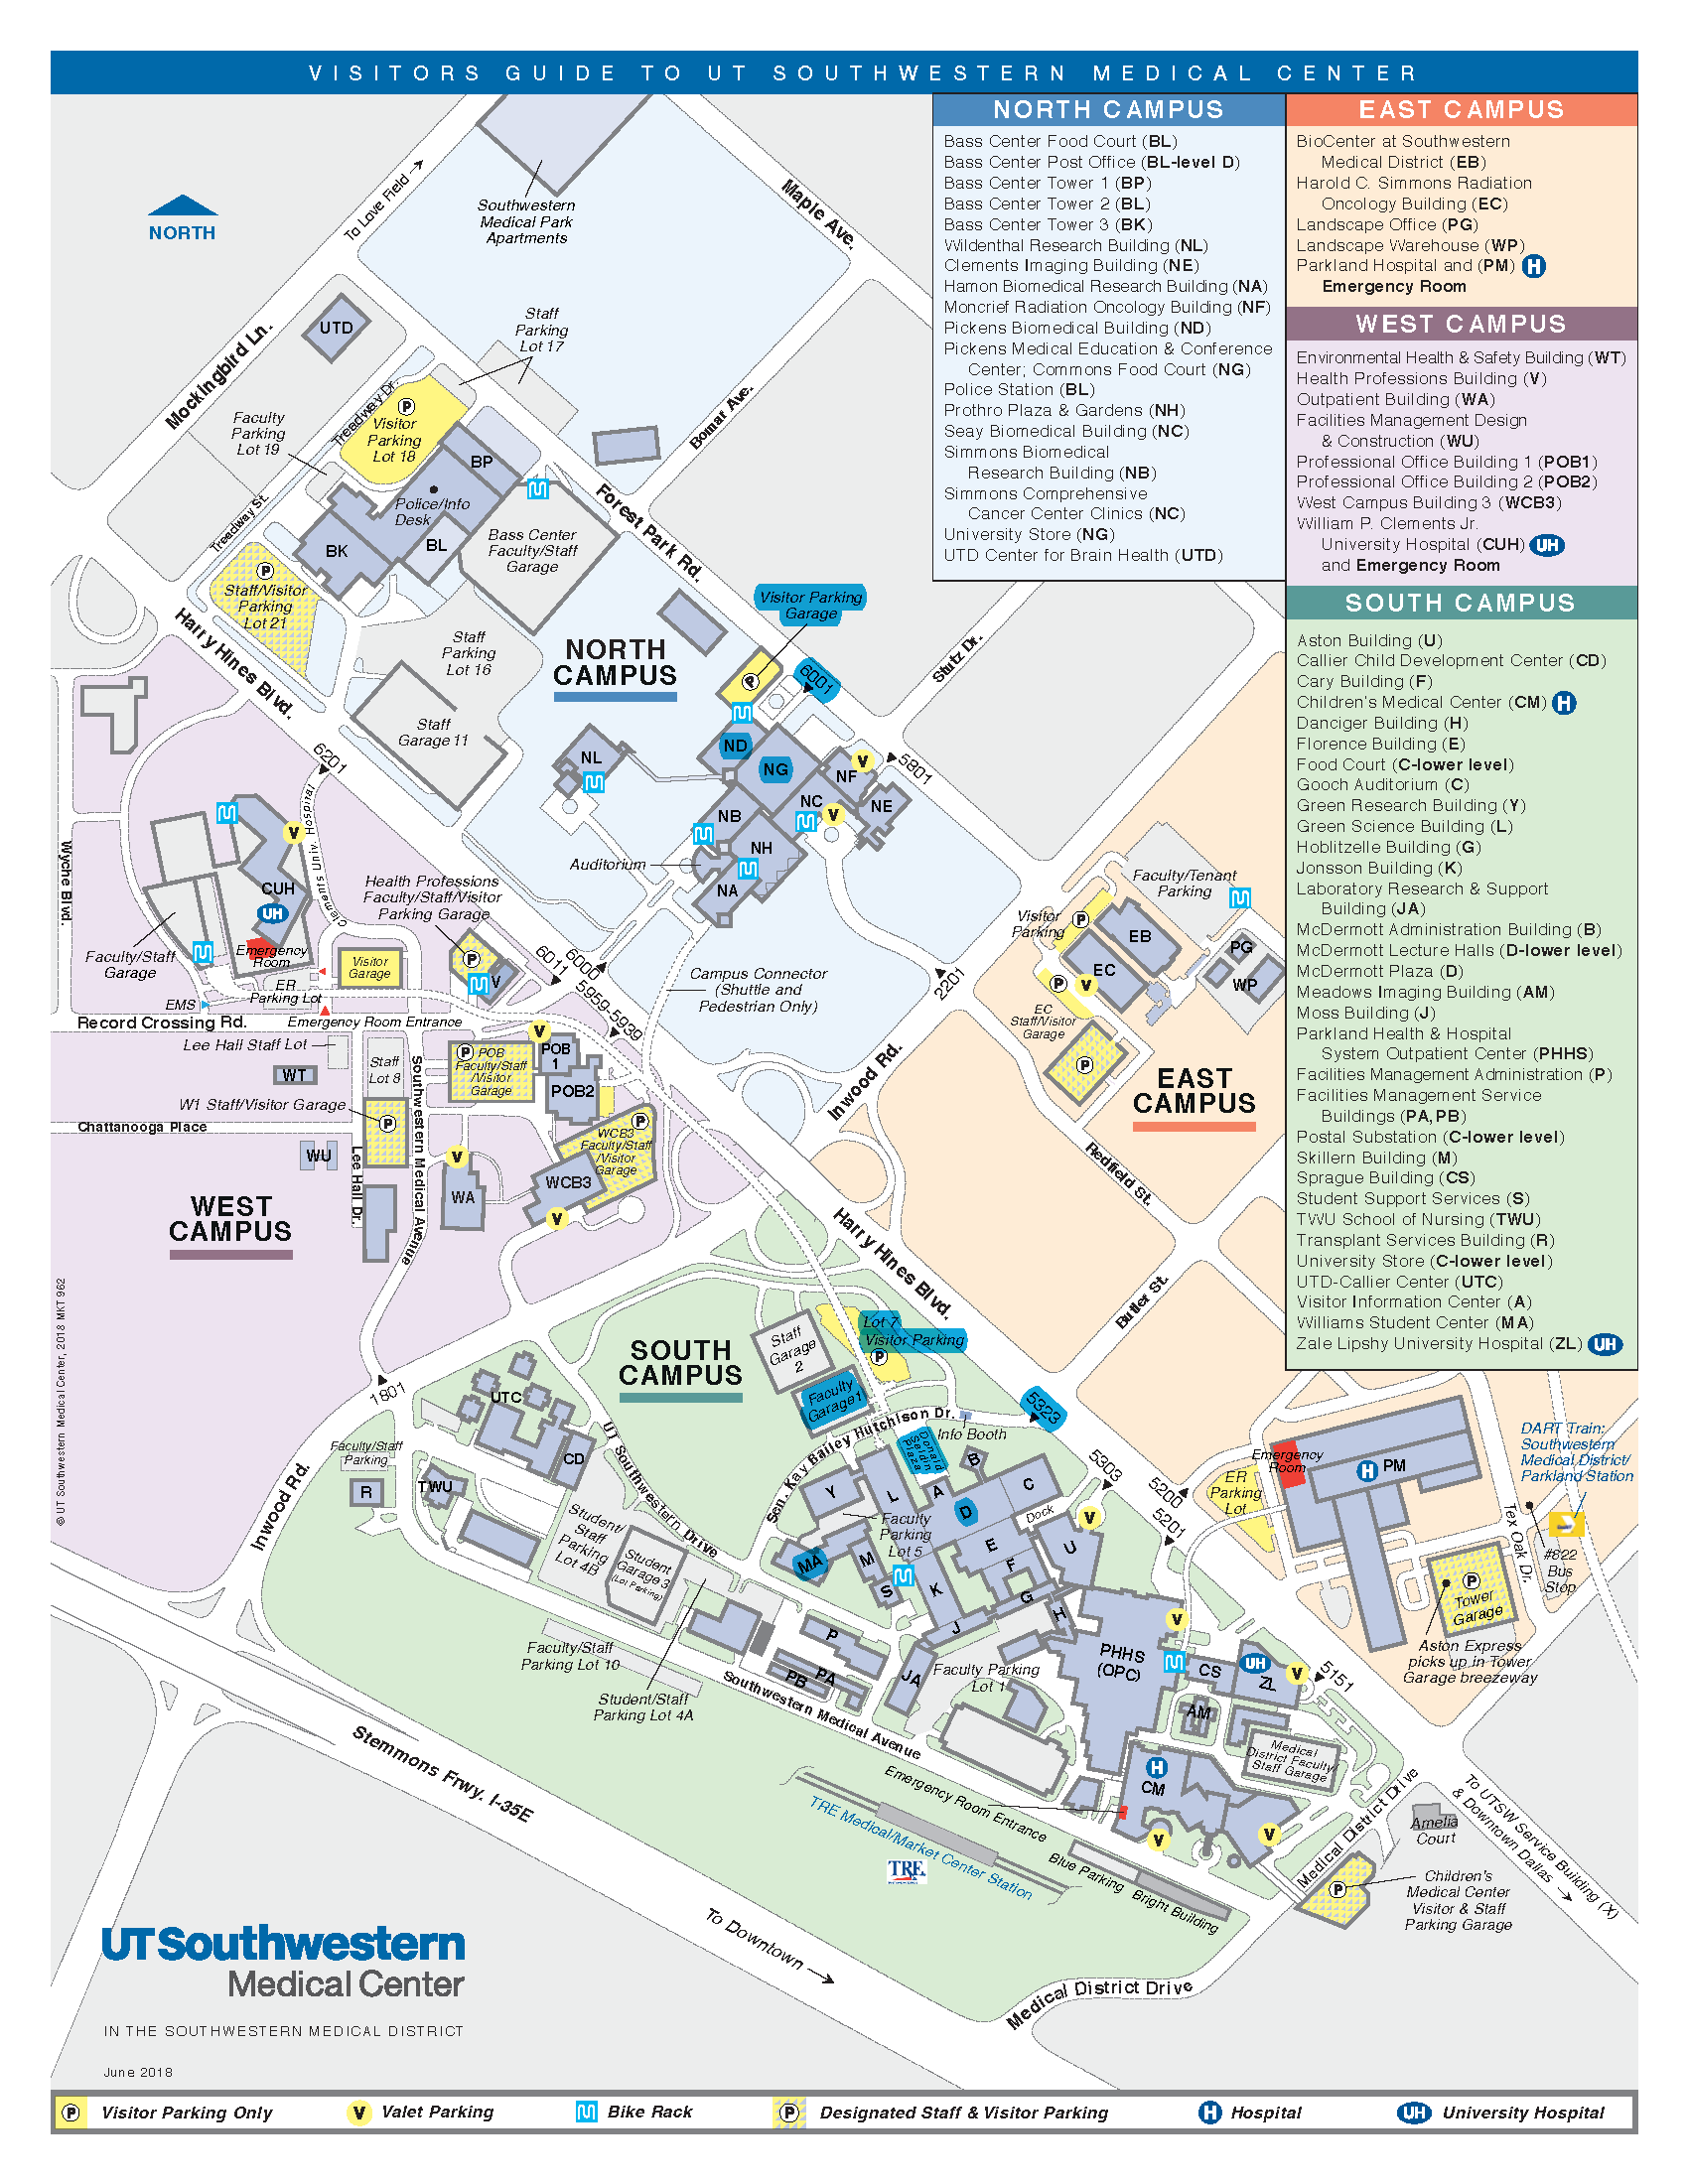 swic belleville campus map Ut Southwestern Campus Map Campus Map swic belleville campus map